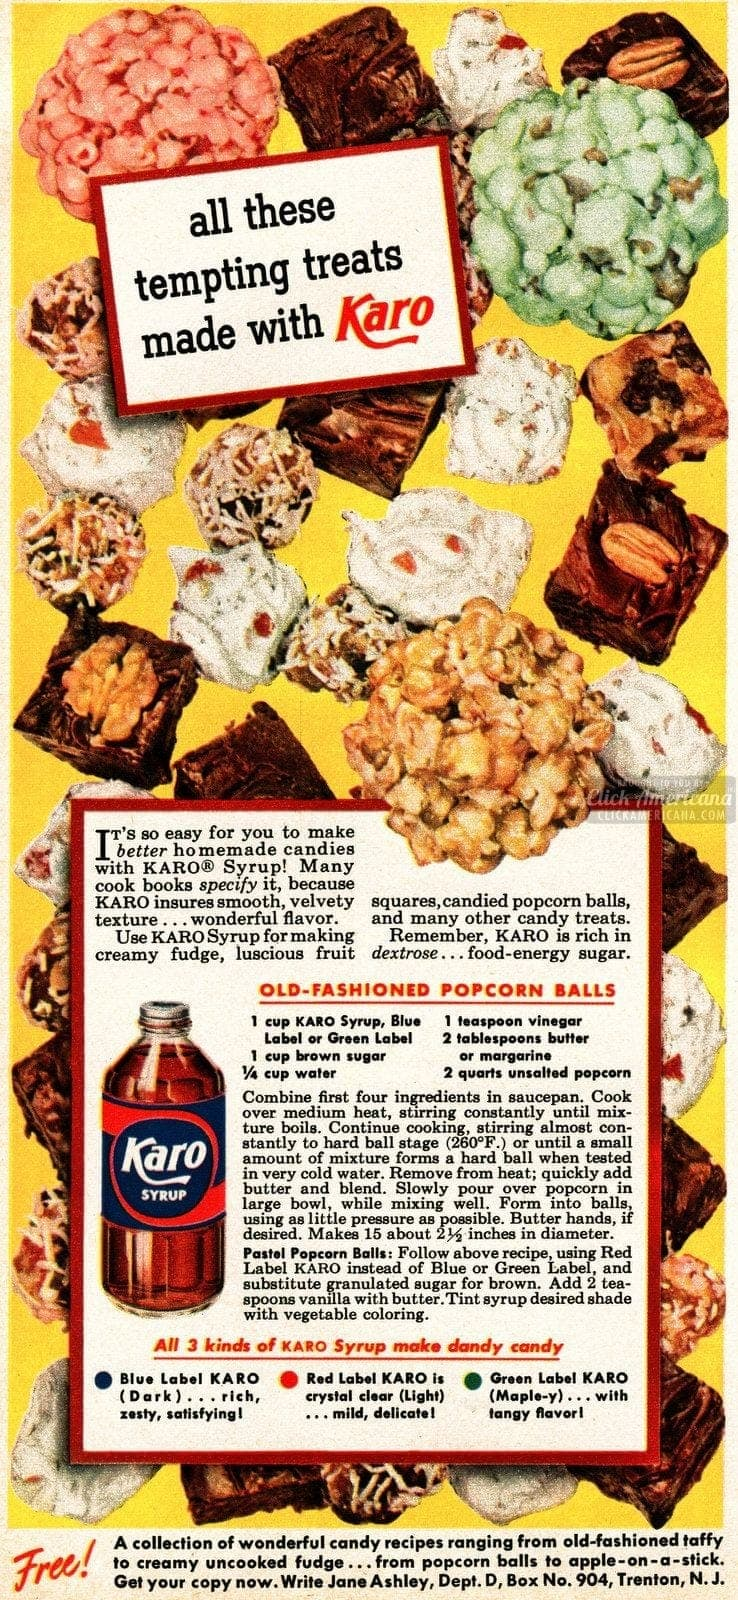 Old-fashioned popcorn balls recipe (1950)